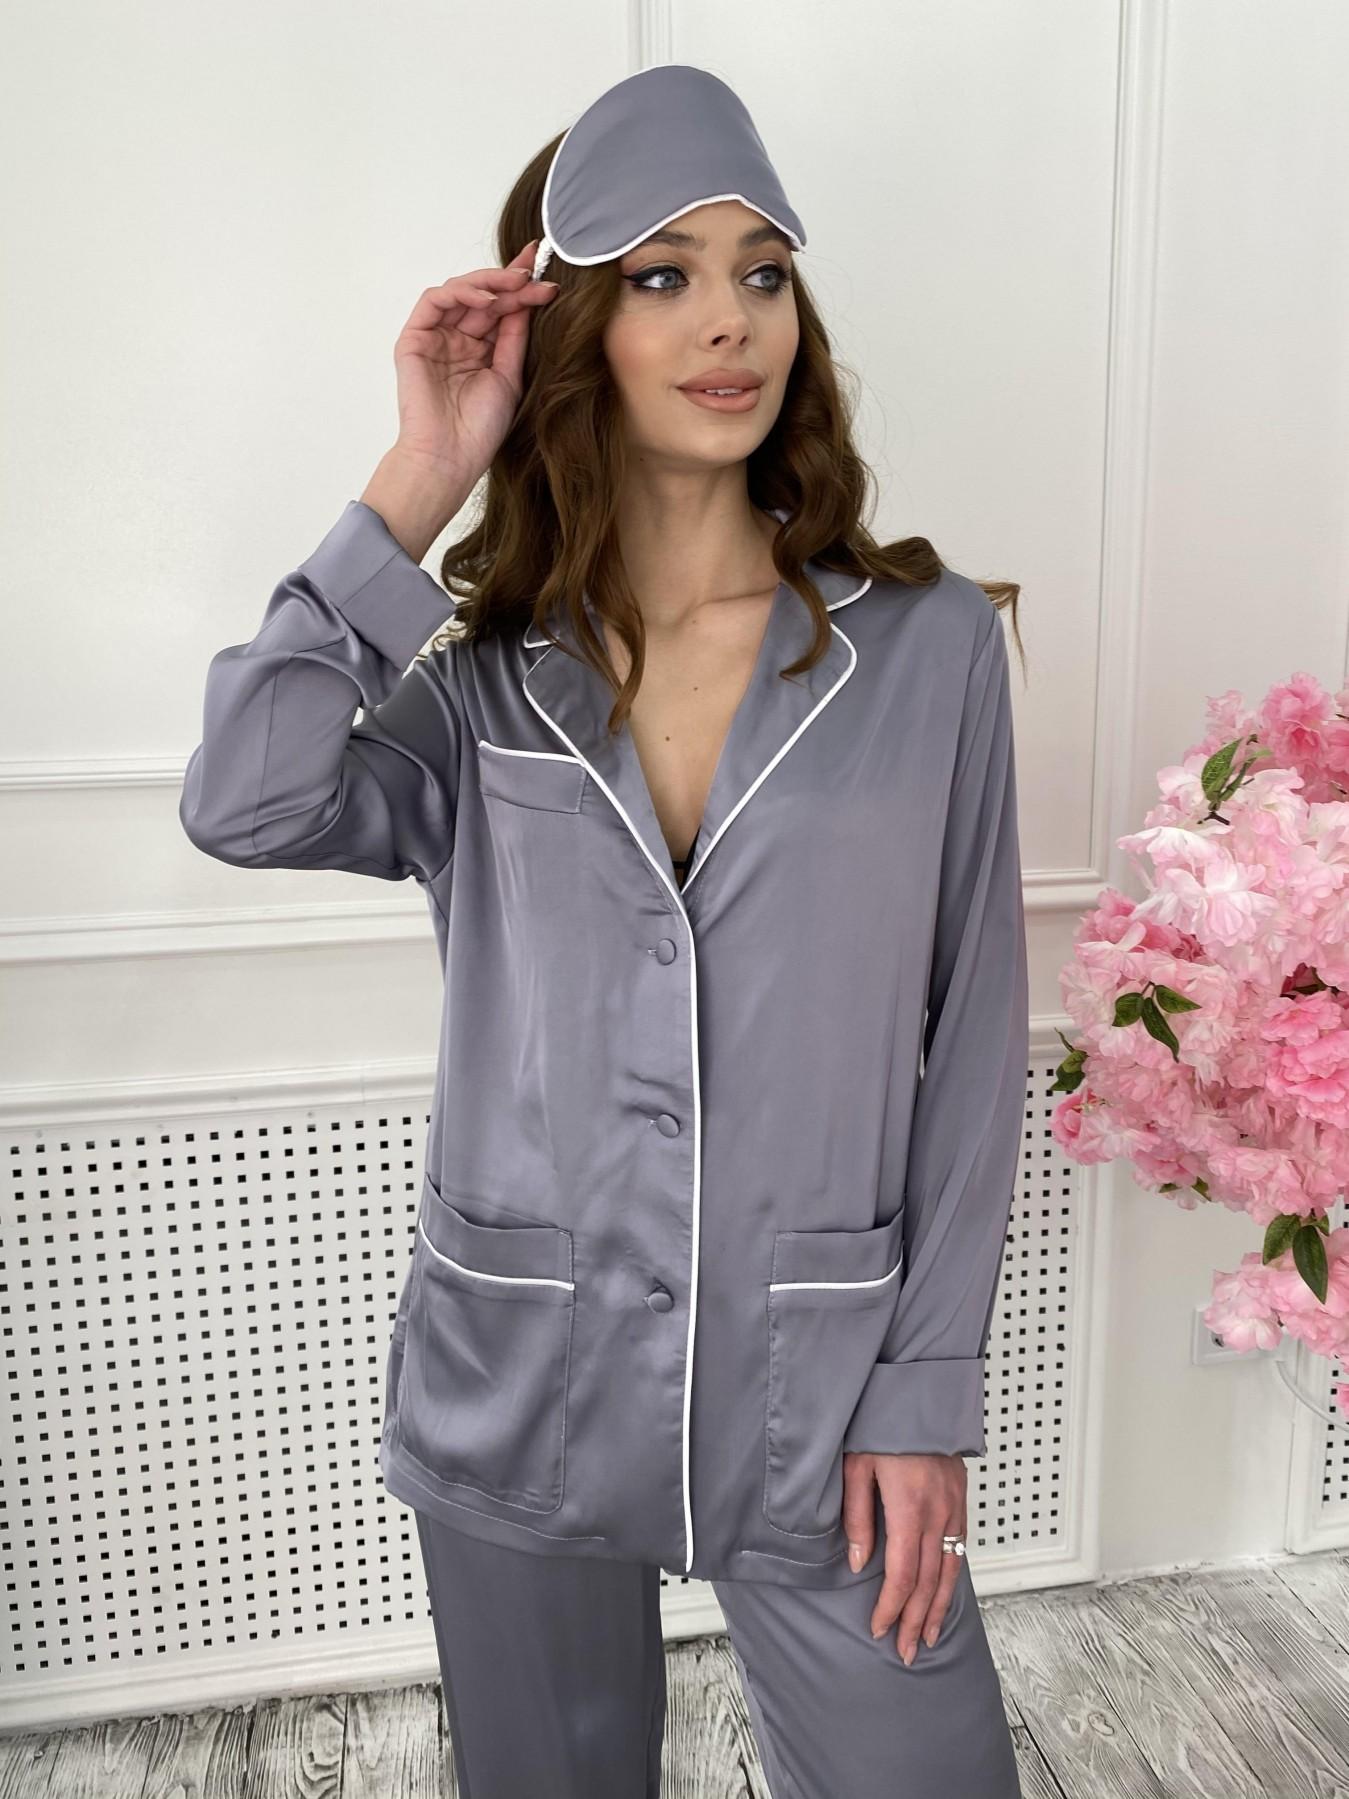 Шайн костюм из шелка  10778 АРТ. 47218 Цвет: темно серый - фото 3, интернет магазин tm-modus.ru